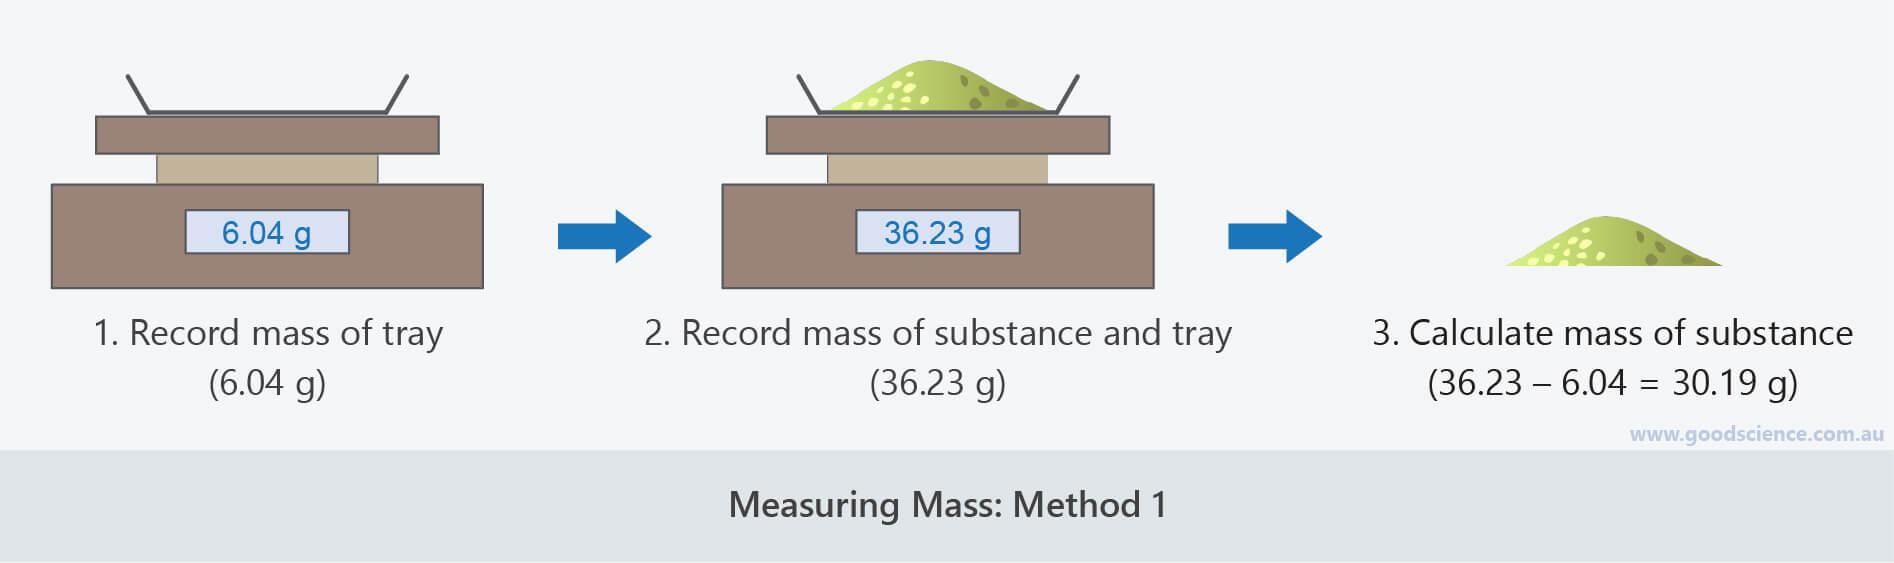 measuring mass electronic balance